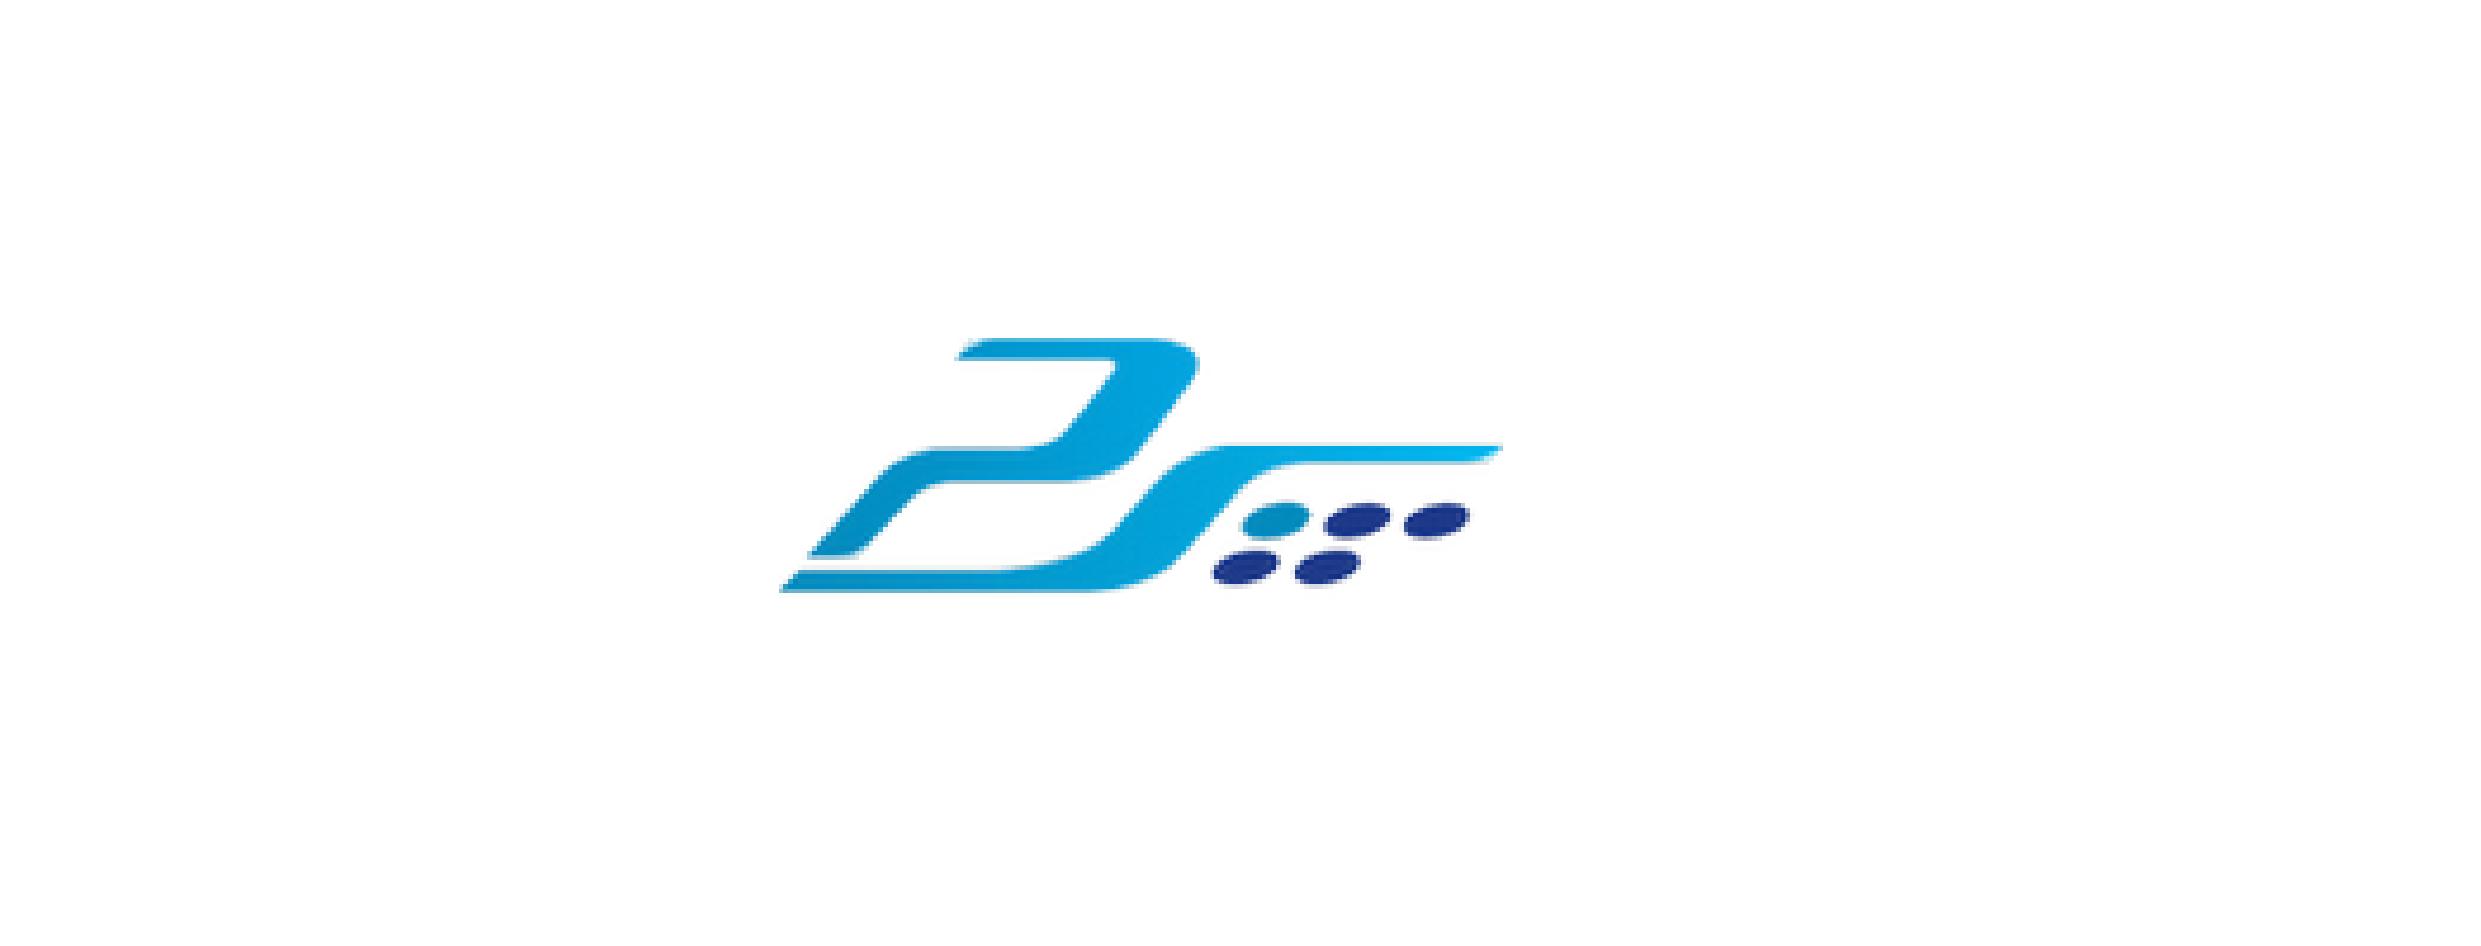 https://www.moj-eracun.rs/cms/wp-content/uploads/2019/06/PSIT-logo.png